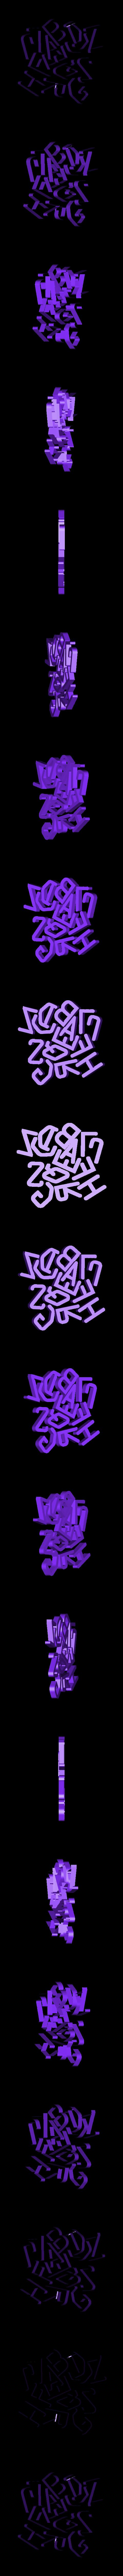 Group_2.stl Download free STL file Fridge Alphabet • 3D printer design, Multifarium